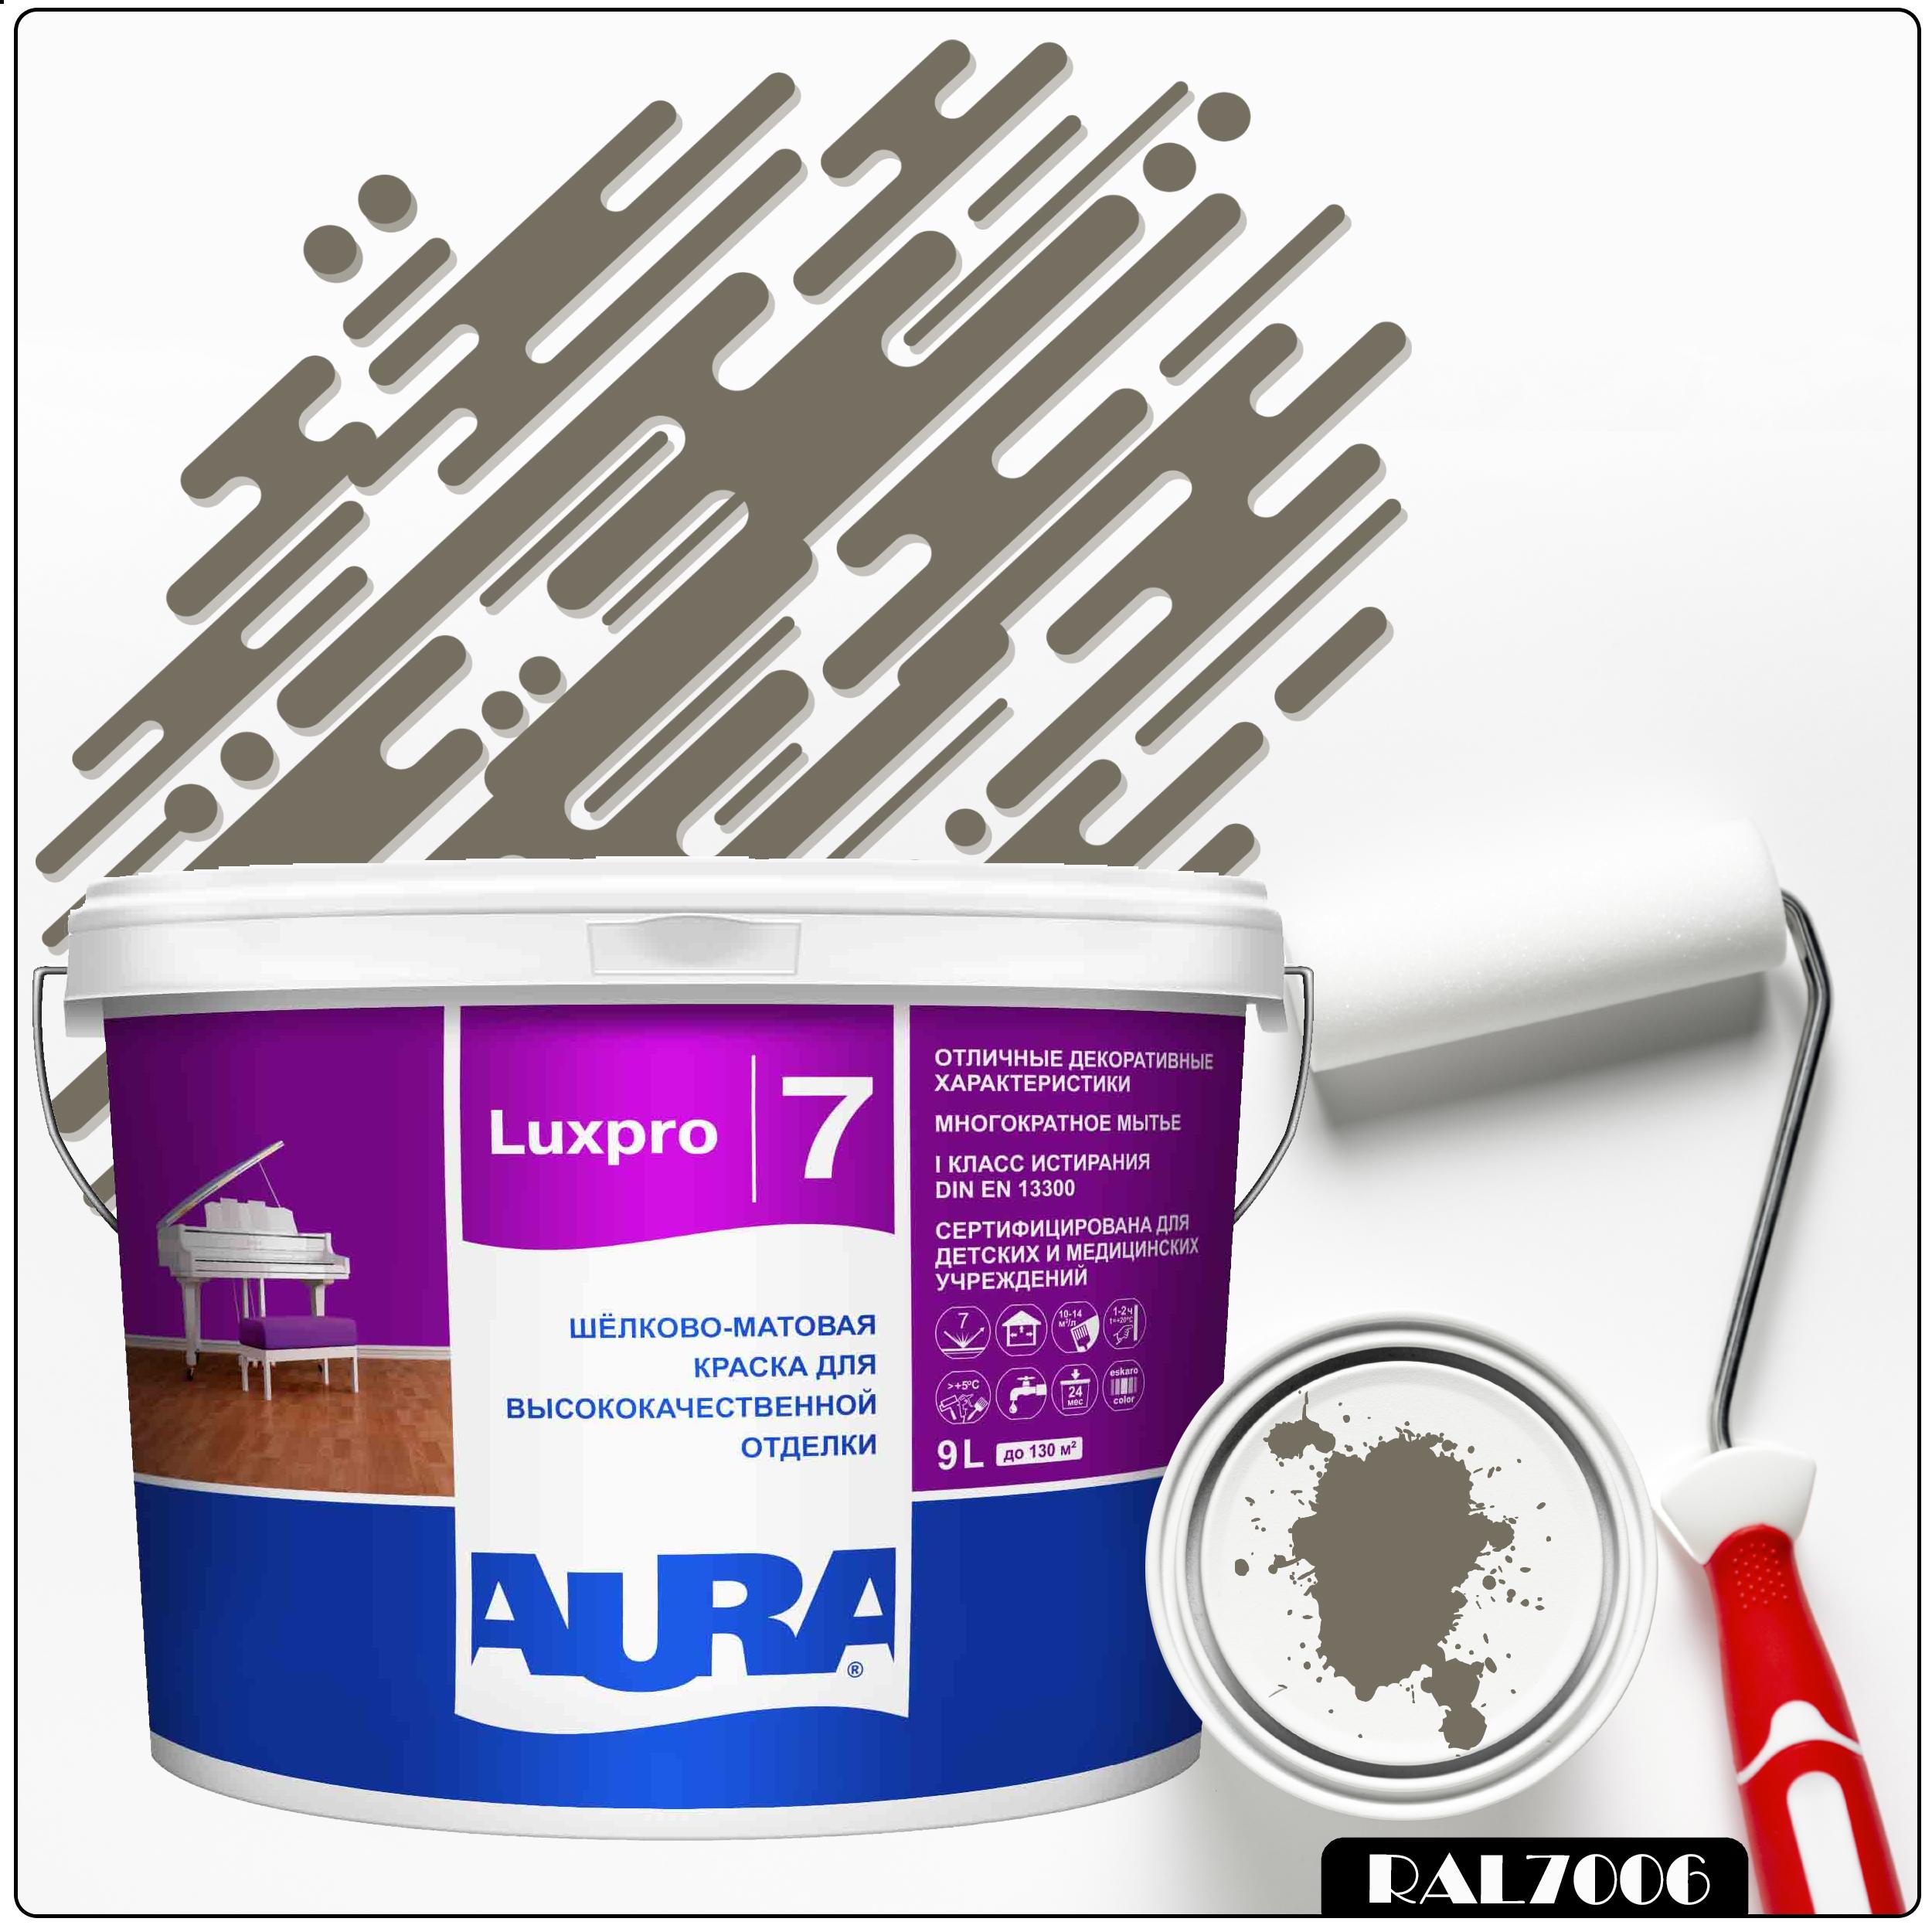 Фото 7 - Краска Aura LuxPRO 7, RAL 7006 Бежево-серый, латексная, шелково-матовая, интерьерная, 9л, Аура.